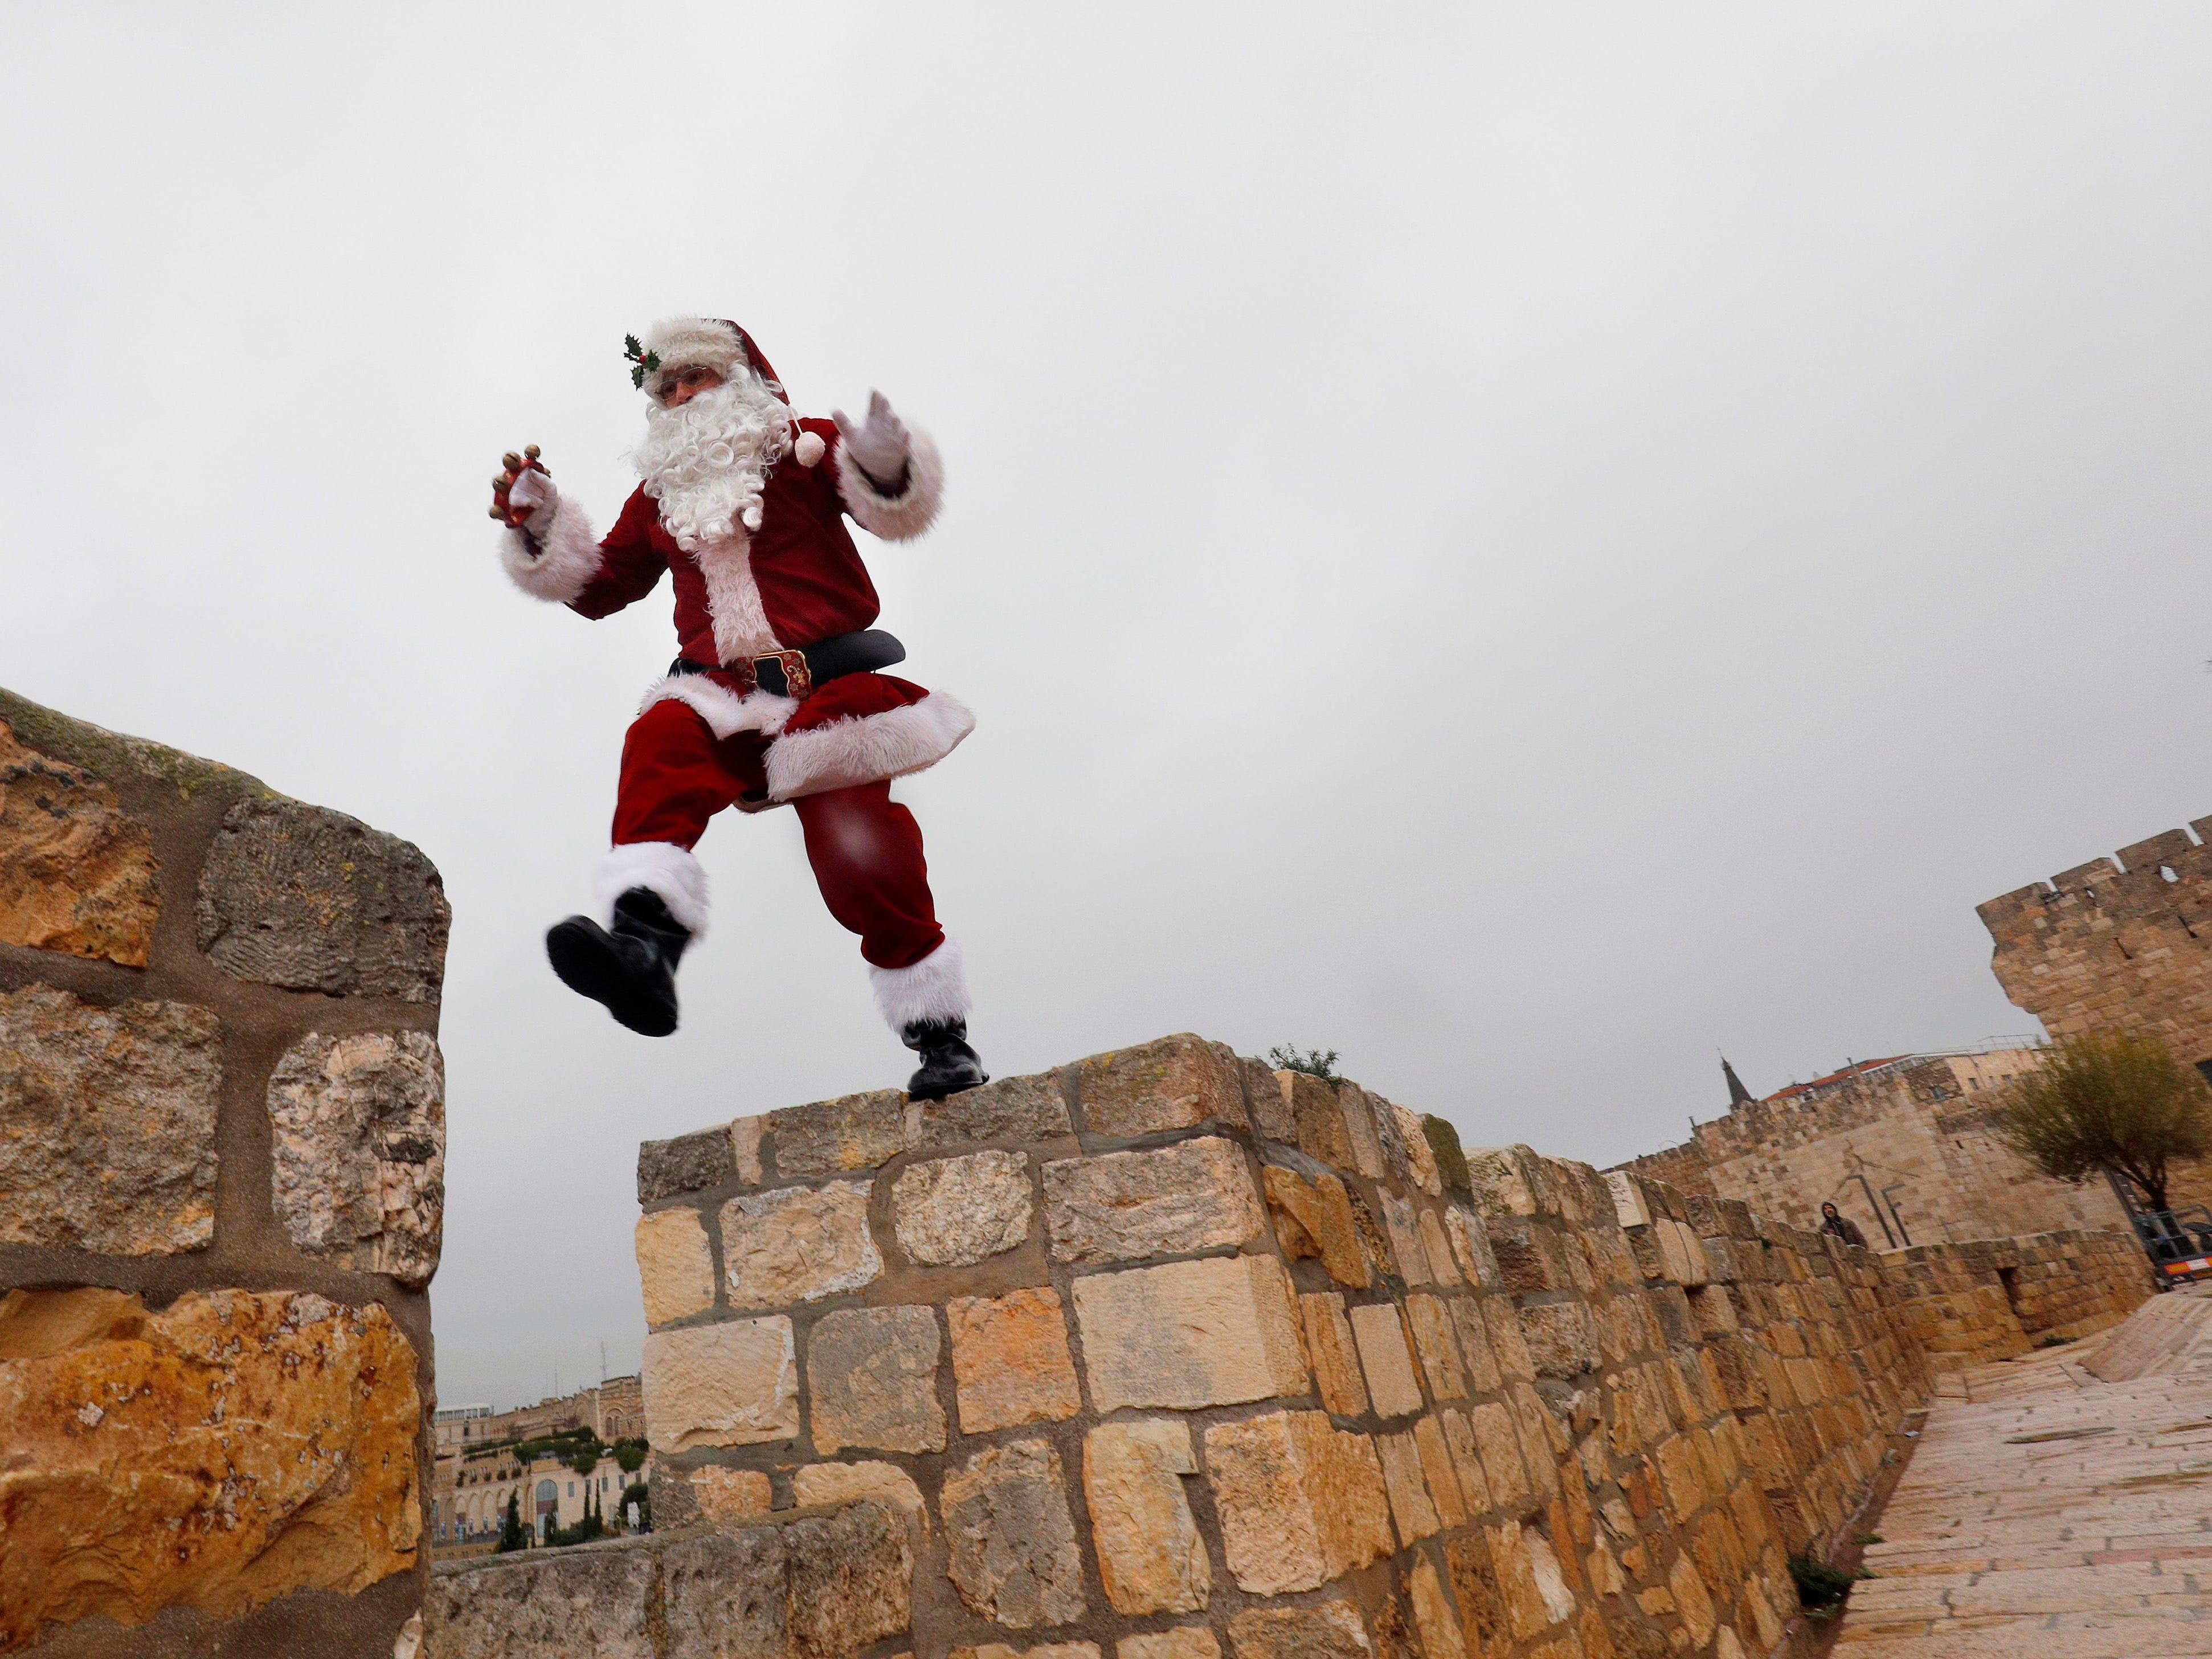 A man dressed as Santa Claus waves as he walks along Jerusalem's Old City Ottoman walls on Dec. 20, 2018.